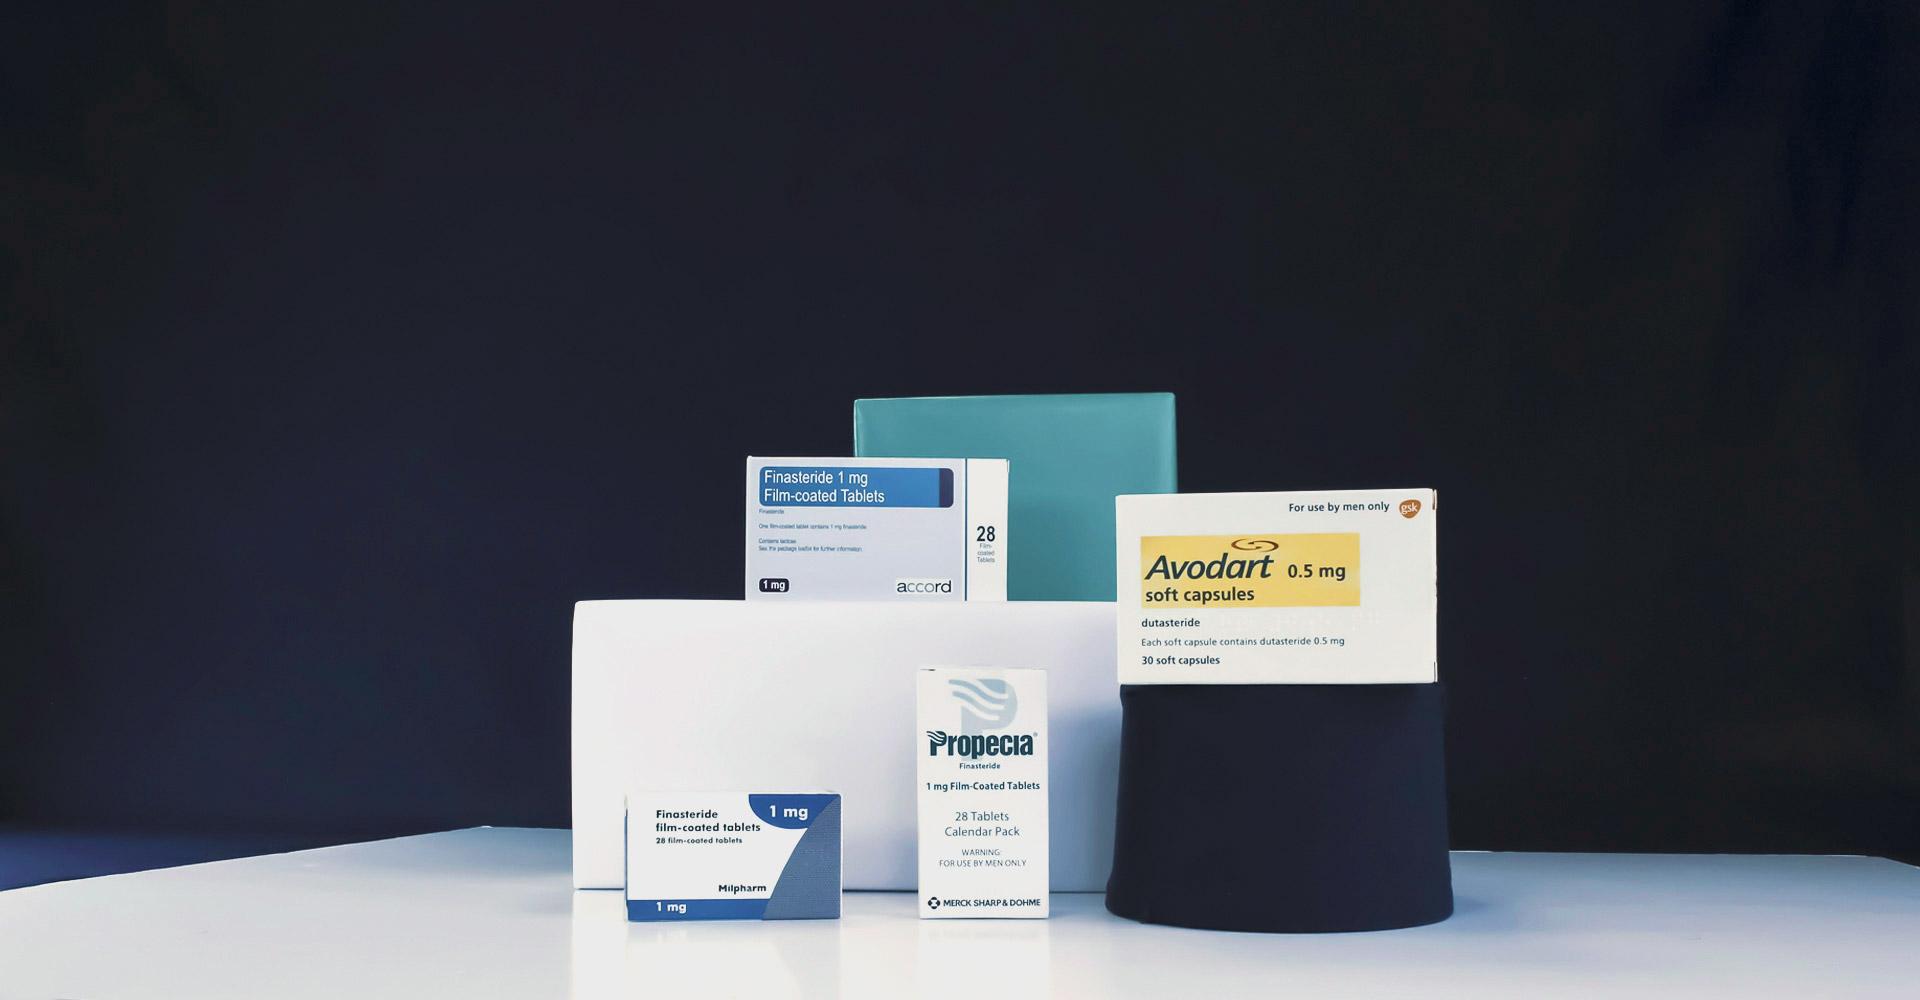 Hair Loss Treatment Online Prescription Uk Privatedoc